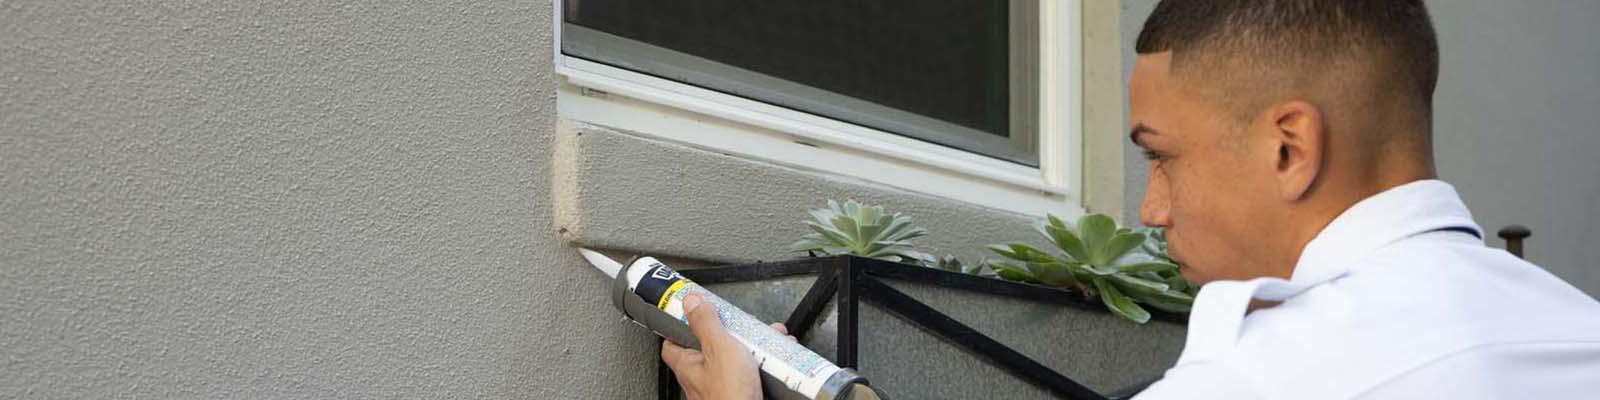 Pest Technician caulking window pane.